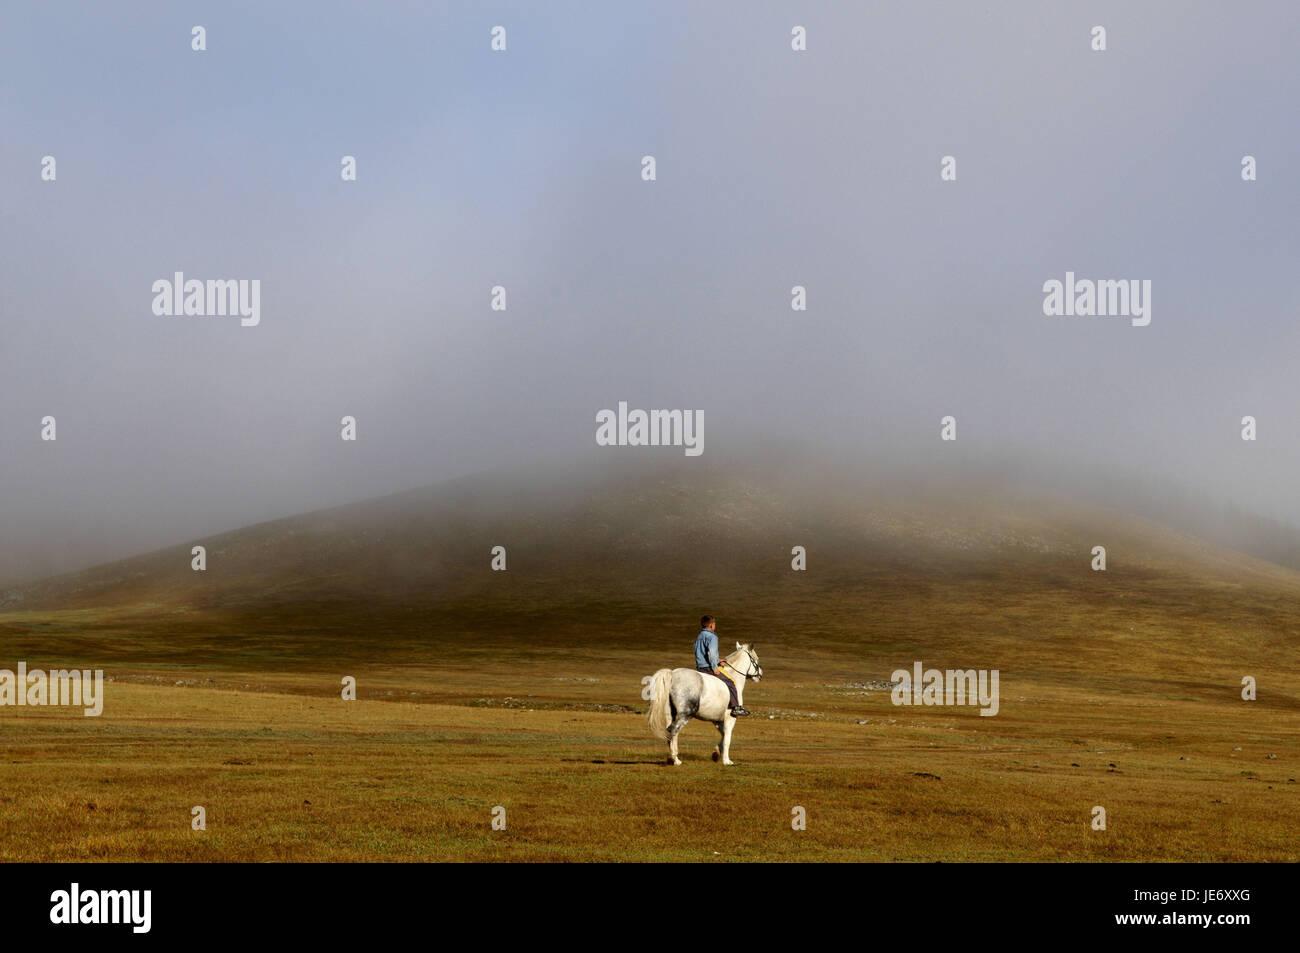 Mongolia, Asia Central, la provincia Arkhangai, boy en white horse, escenografía, niebla, Imagen De Stock